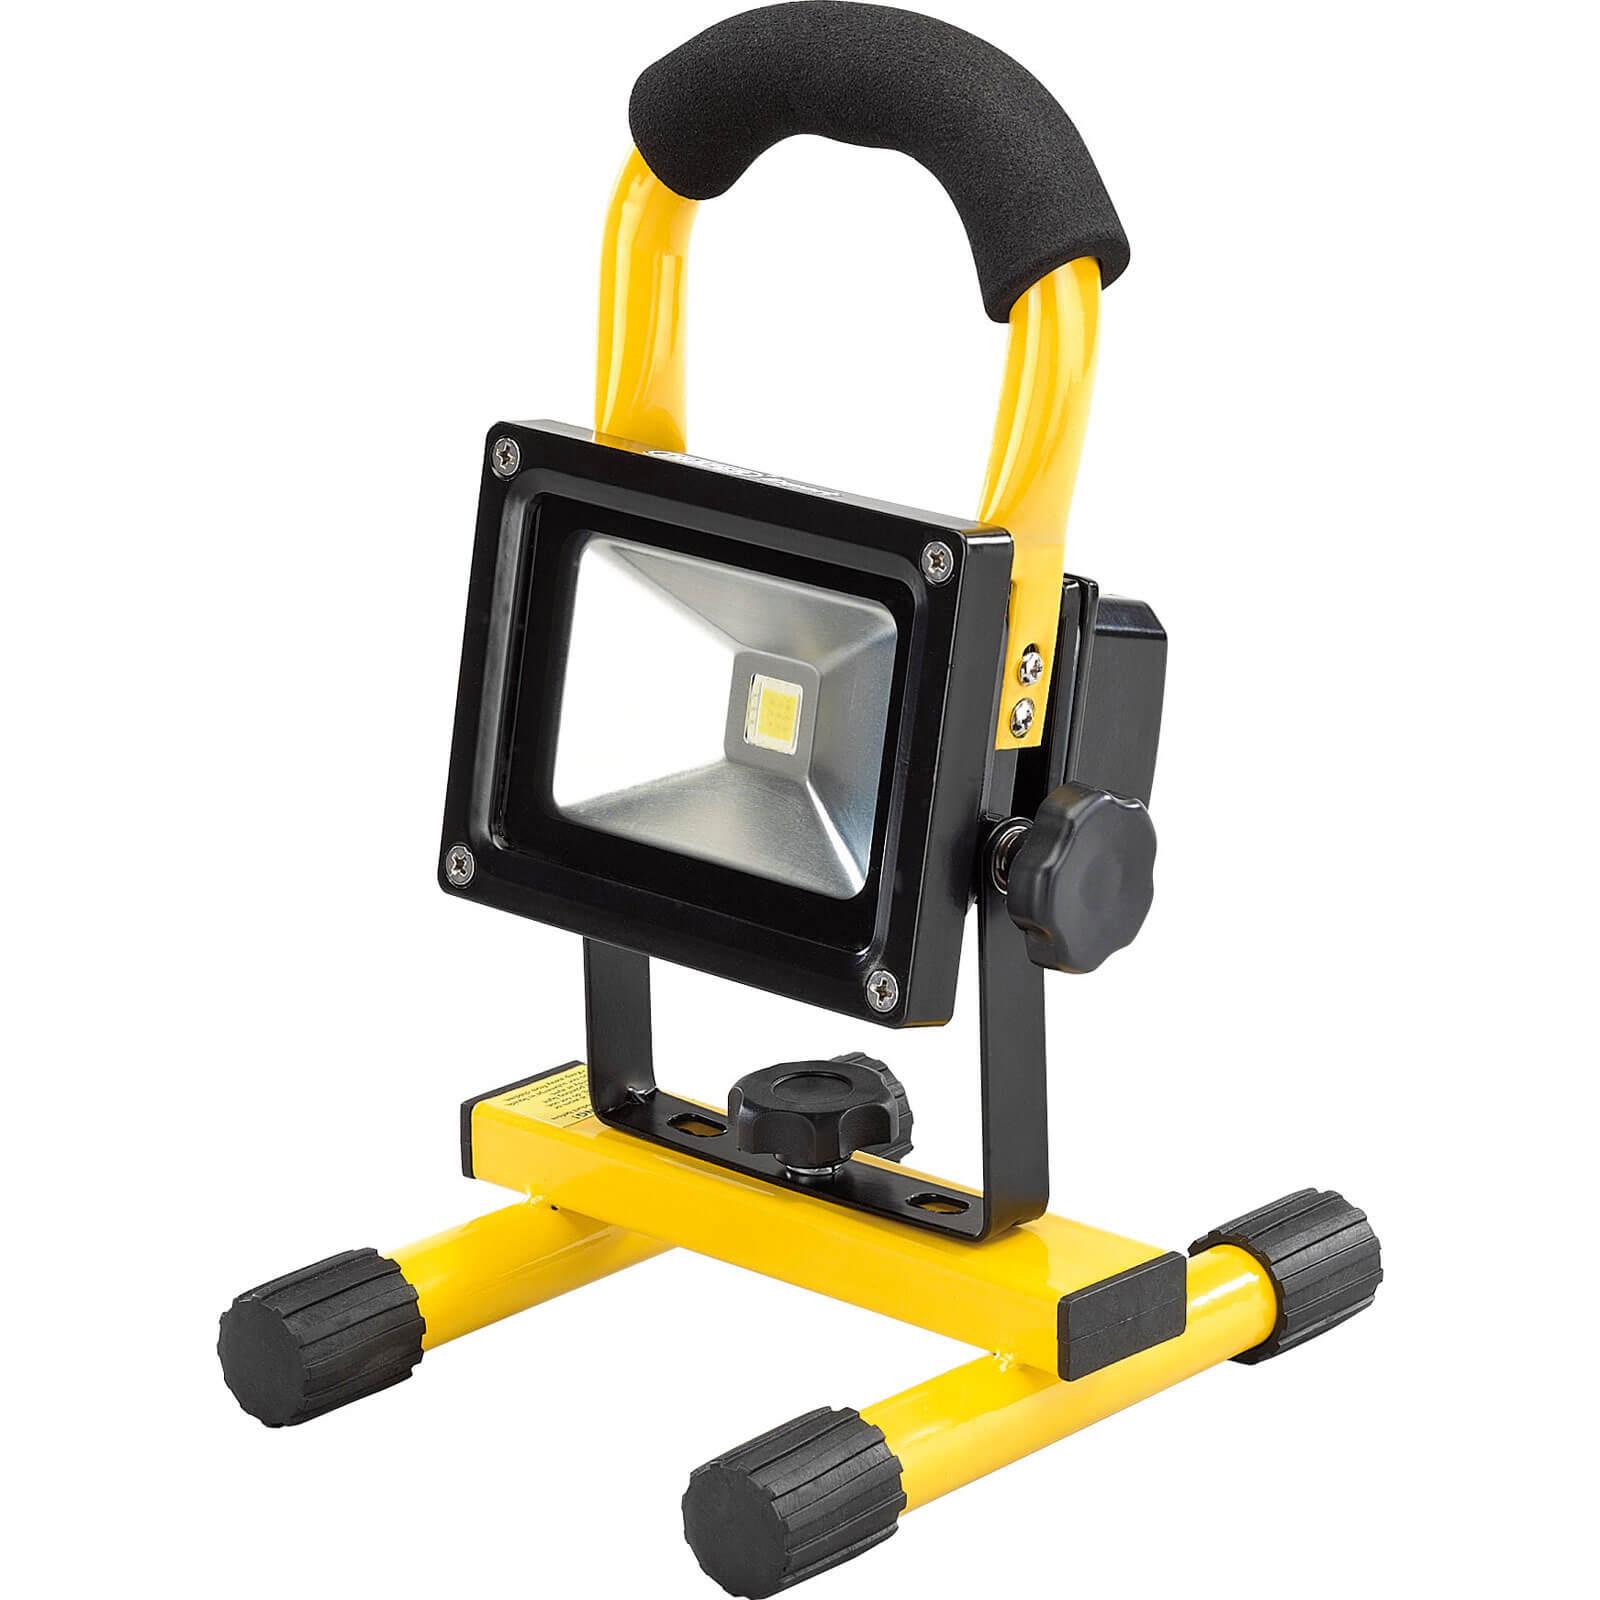 Image of Draper Expert Rechargeable COB LED Work Light